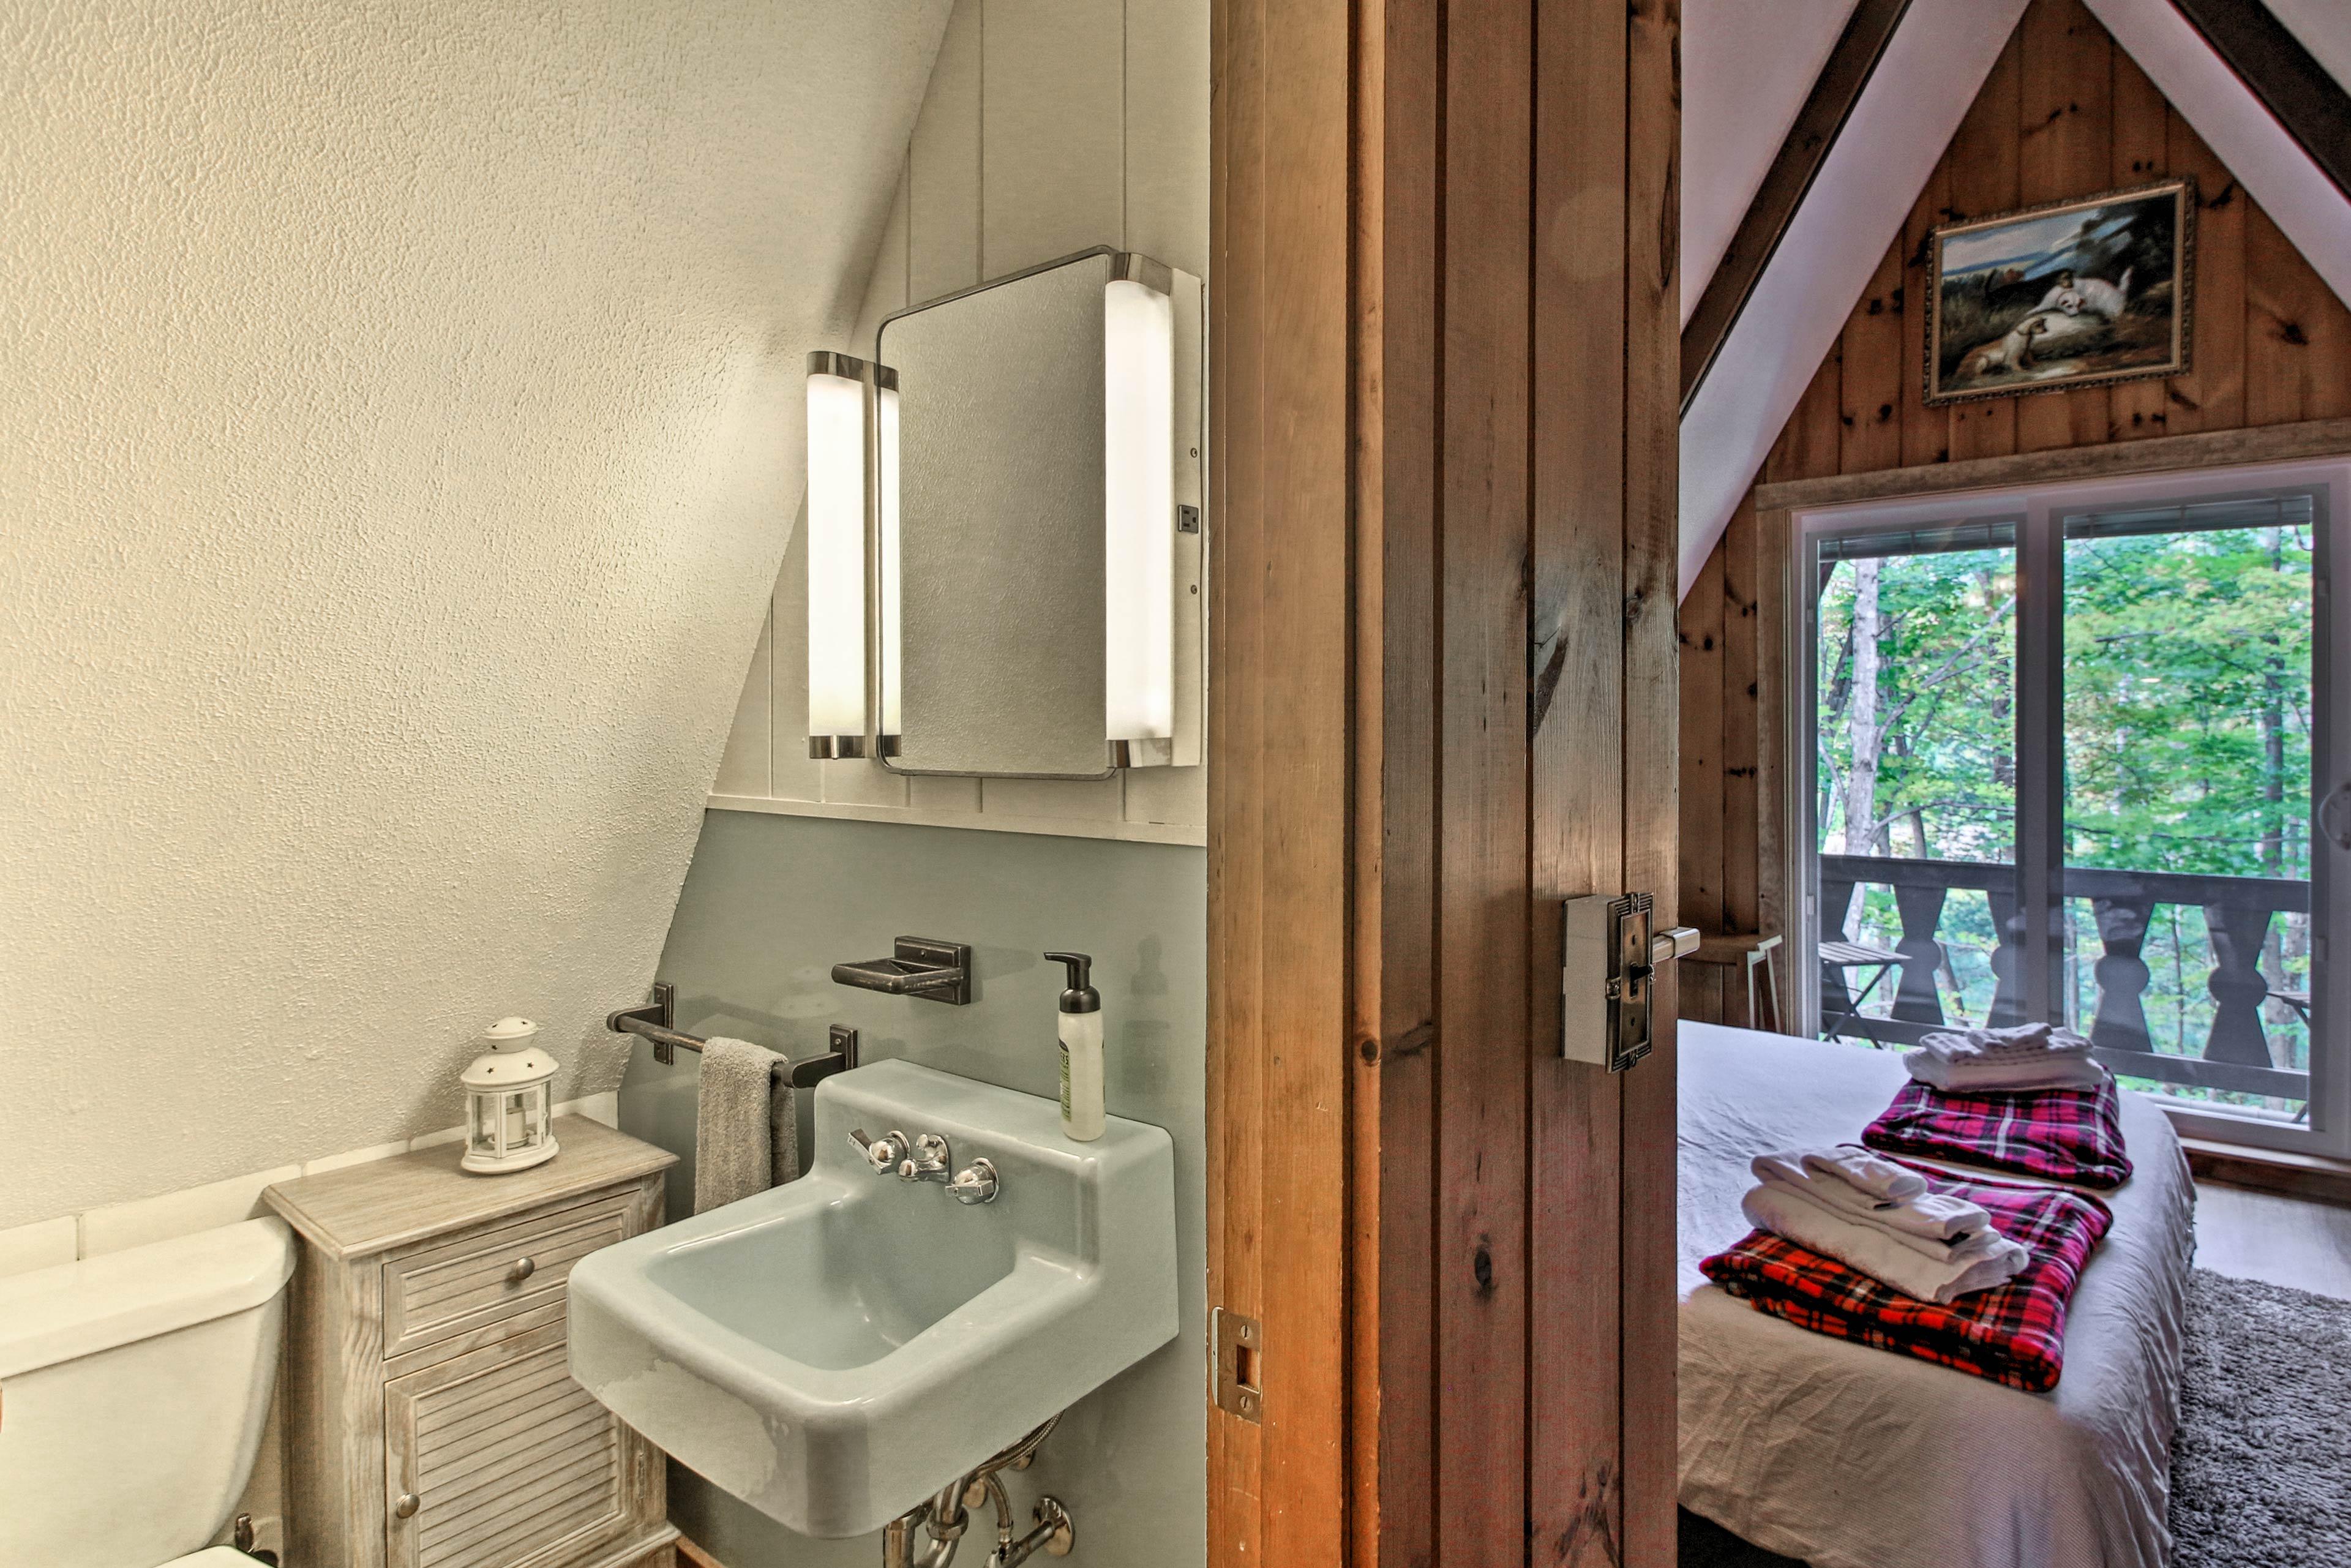 This bedroom is complete with an en-suite bathroom.